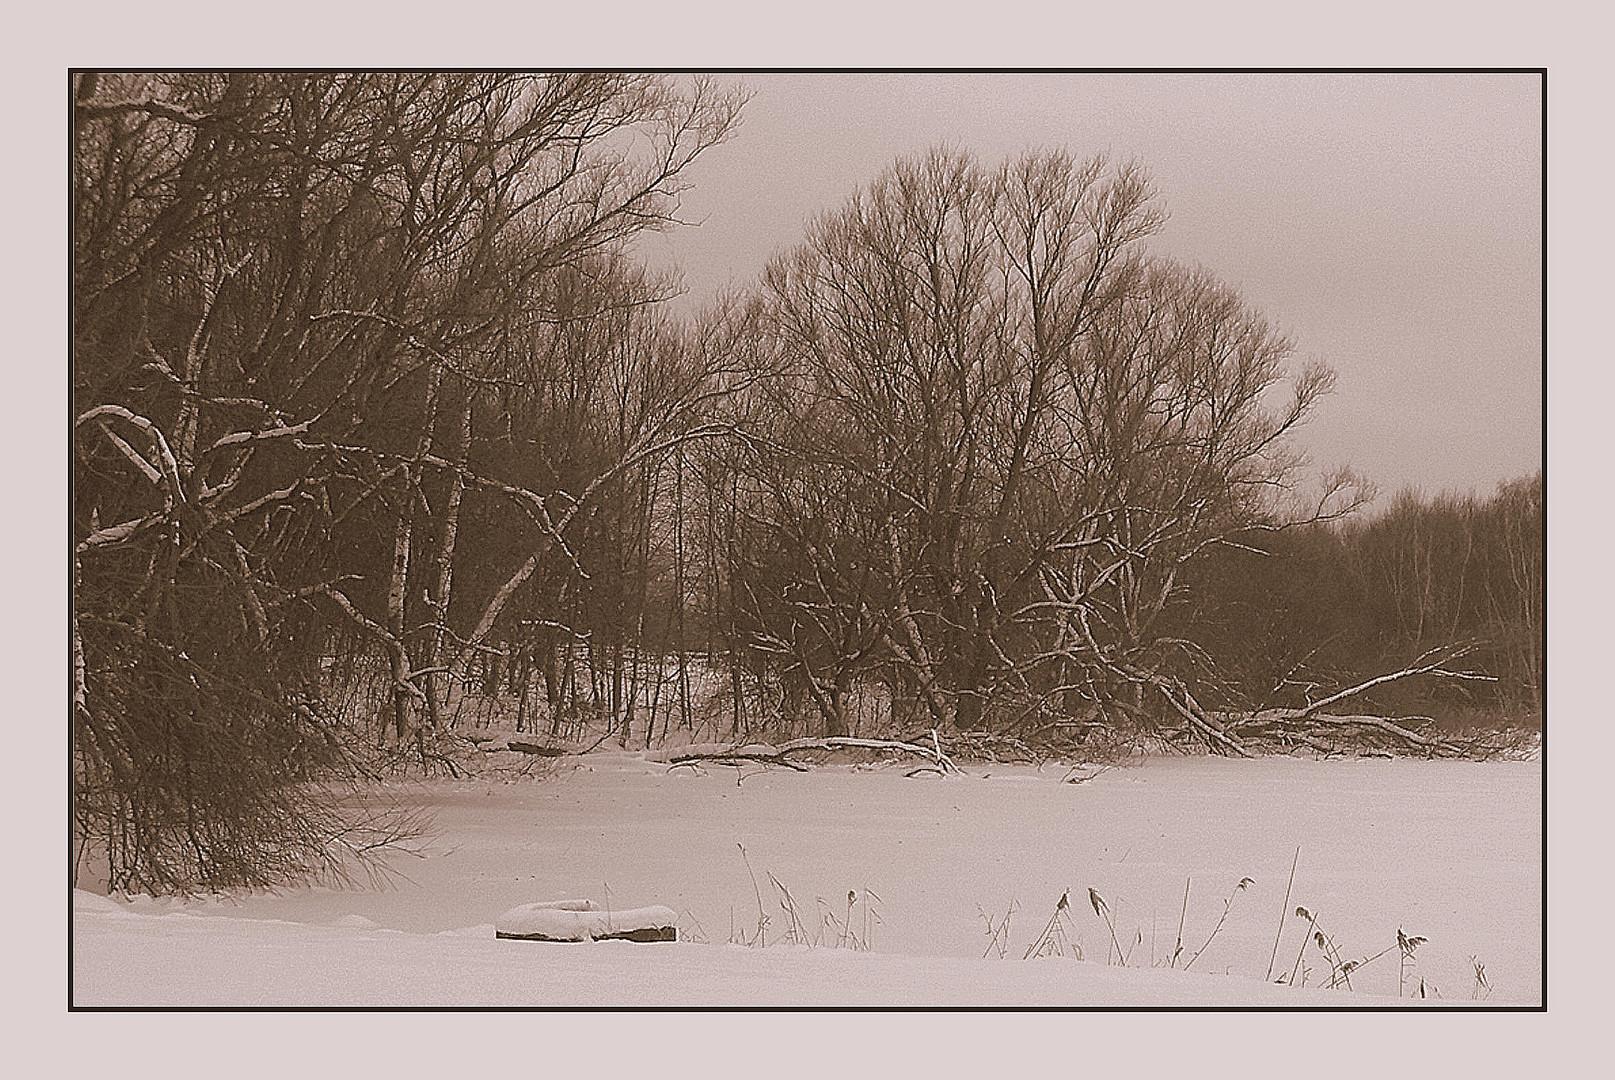 Winter am Teich